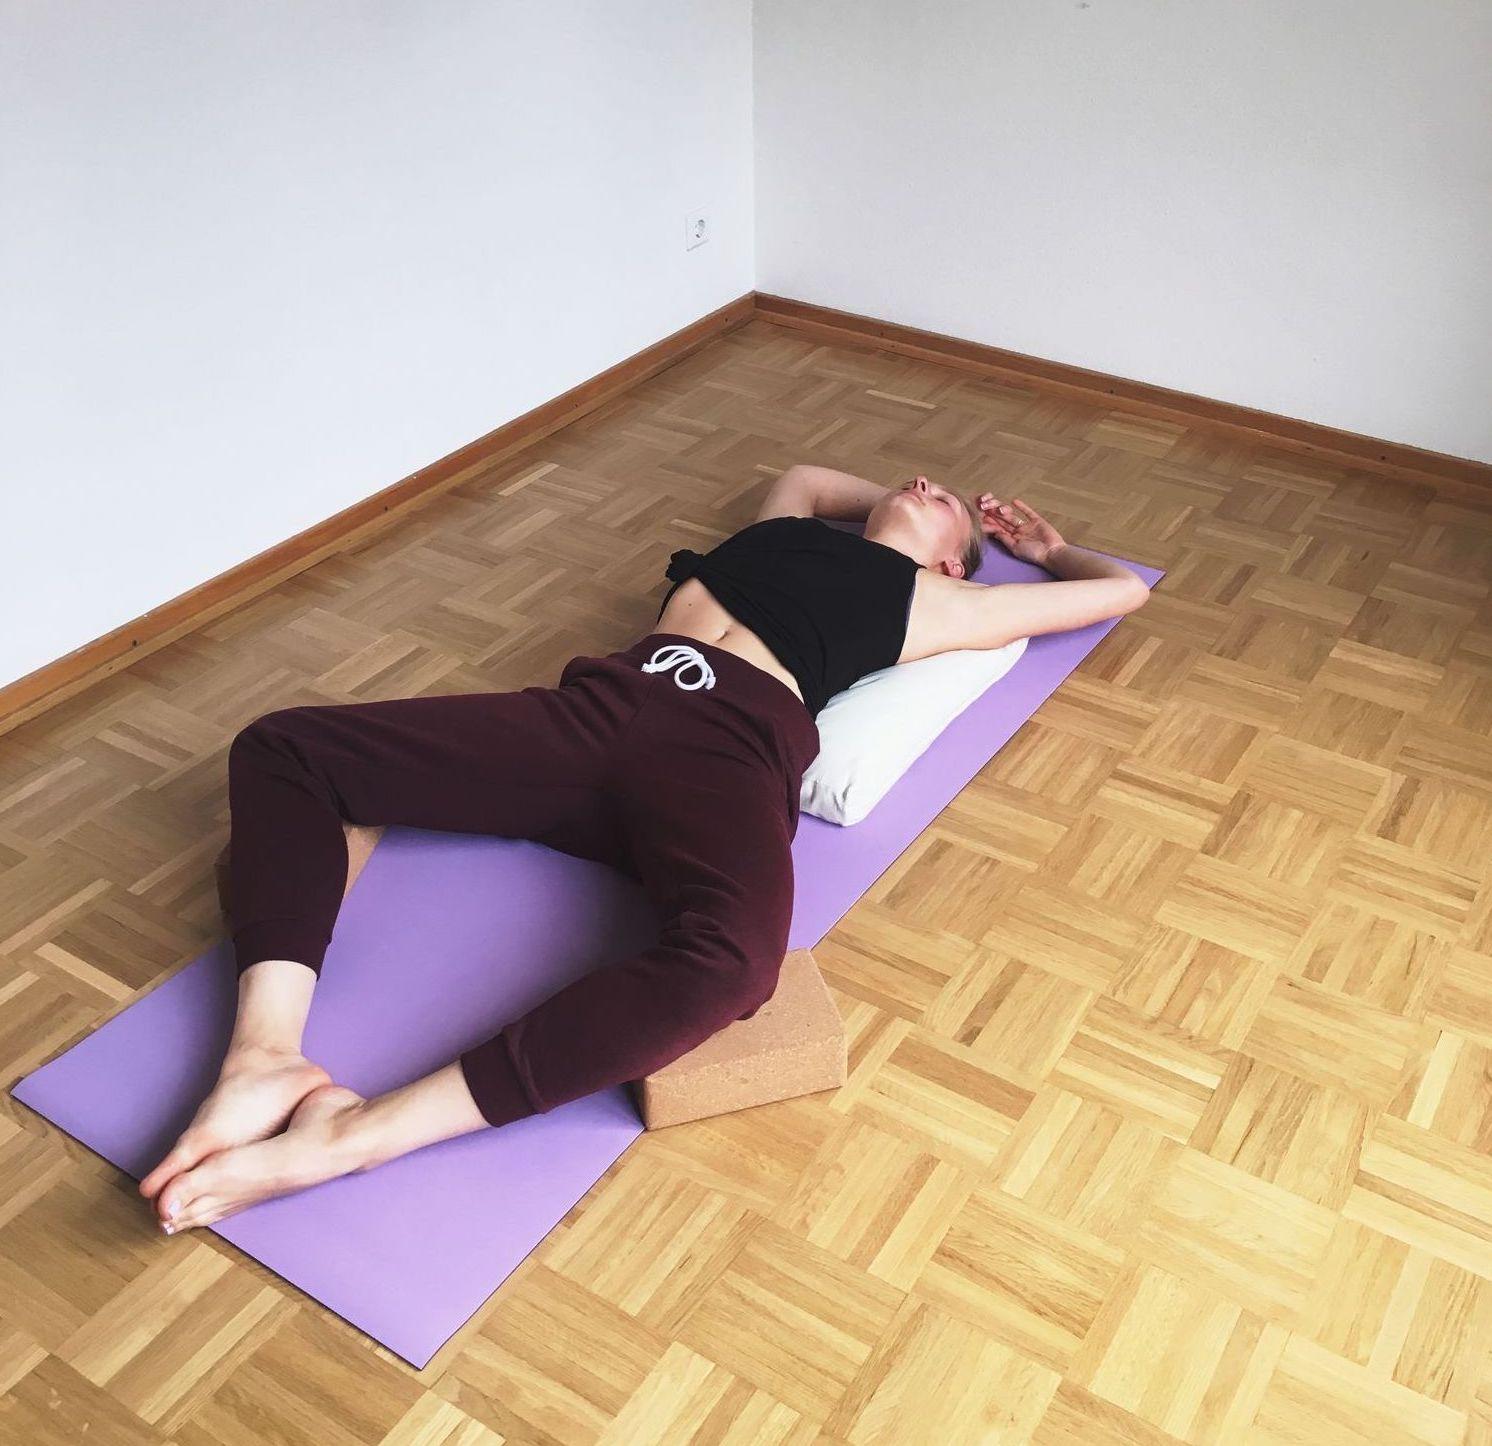 Frau Yin Yoga liegender Schmetterling Asana